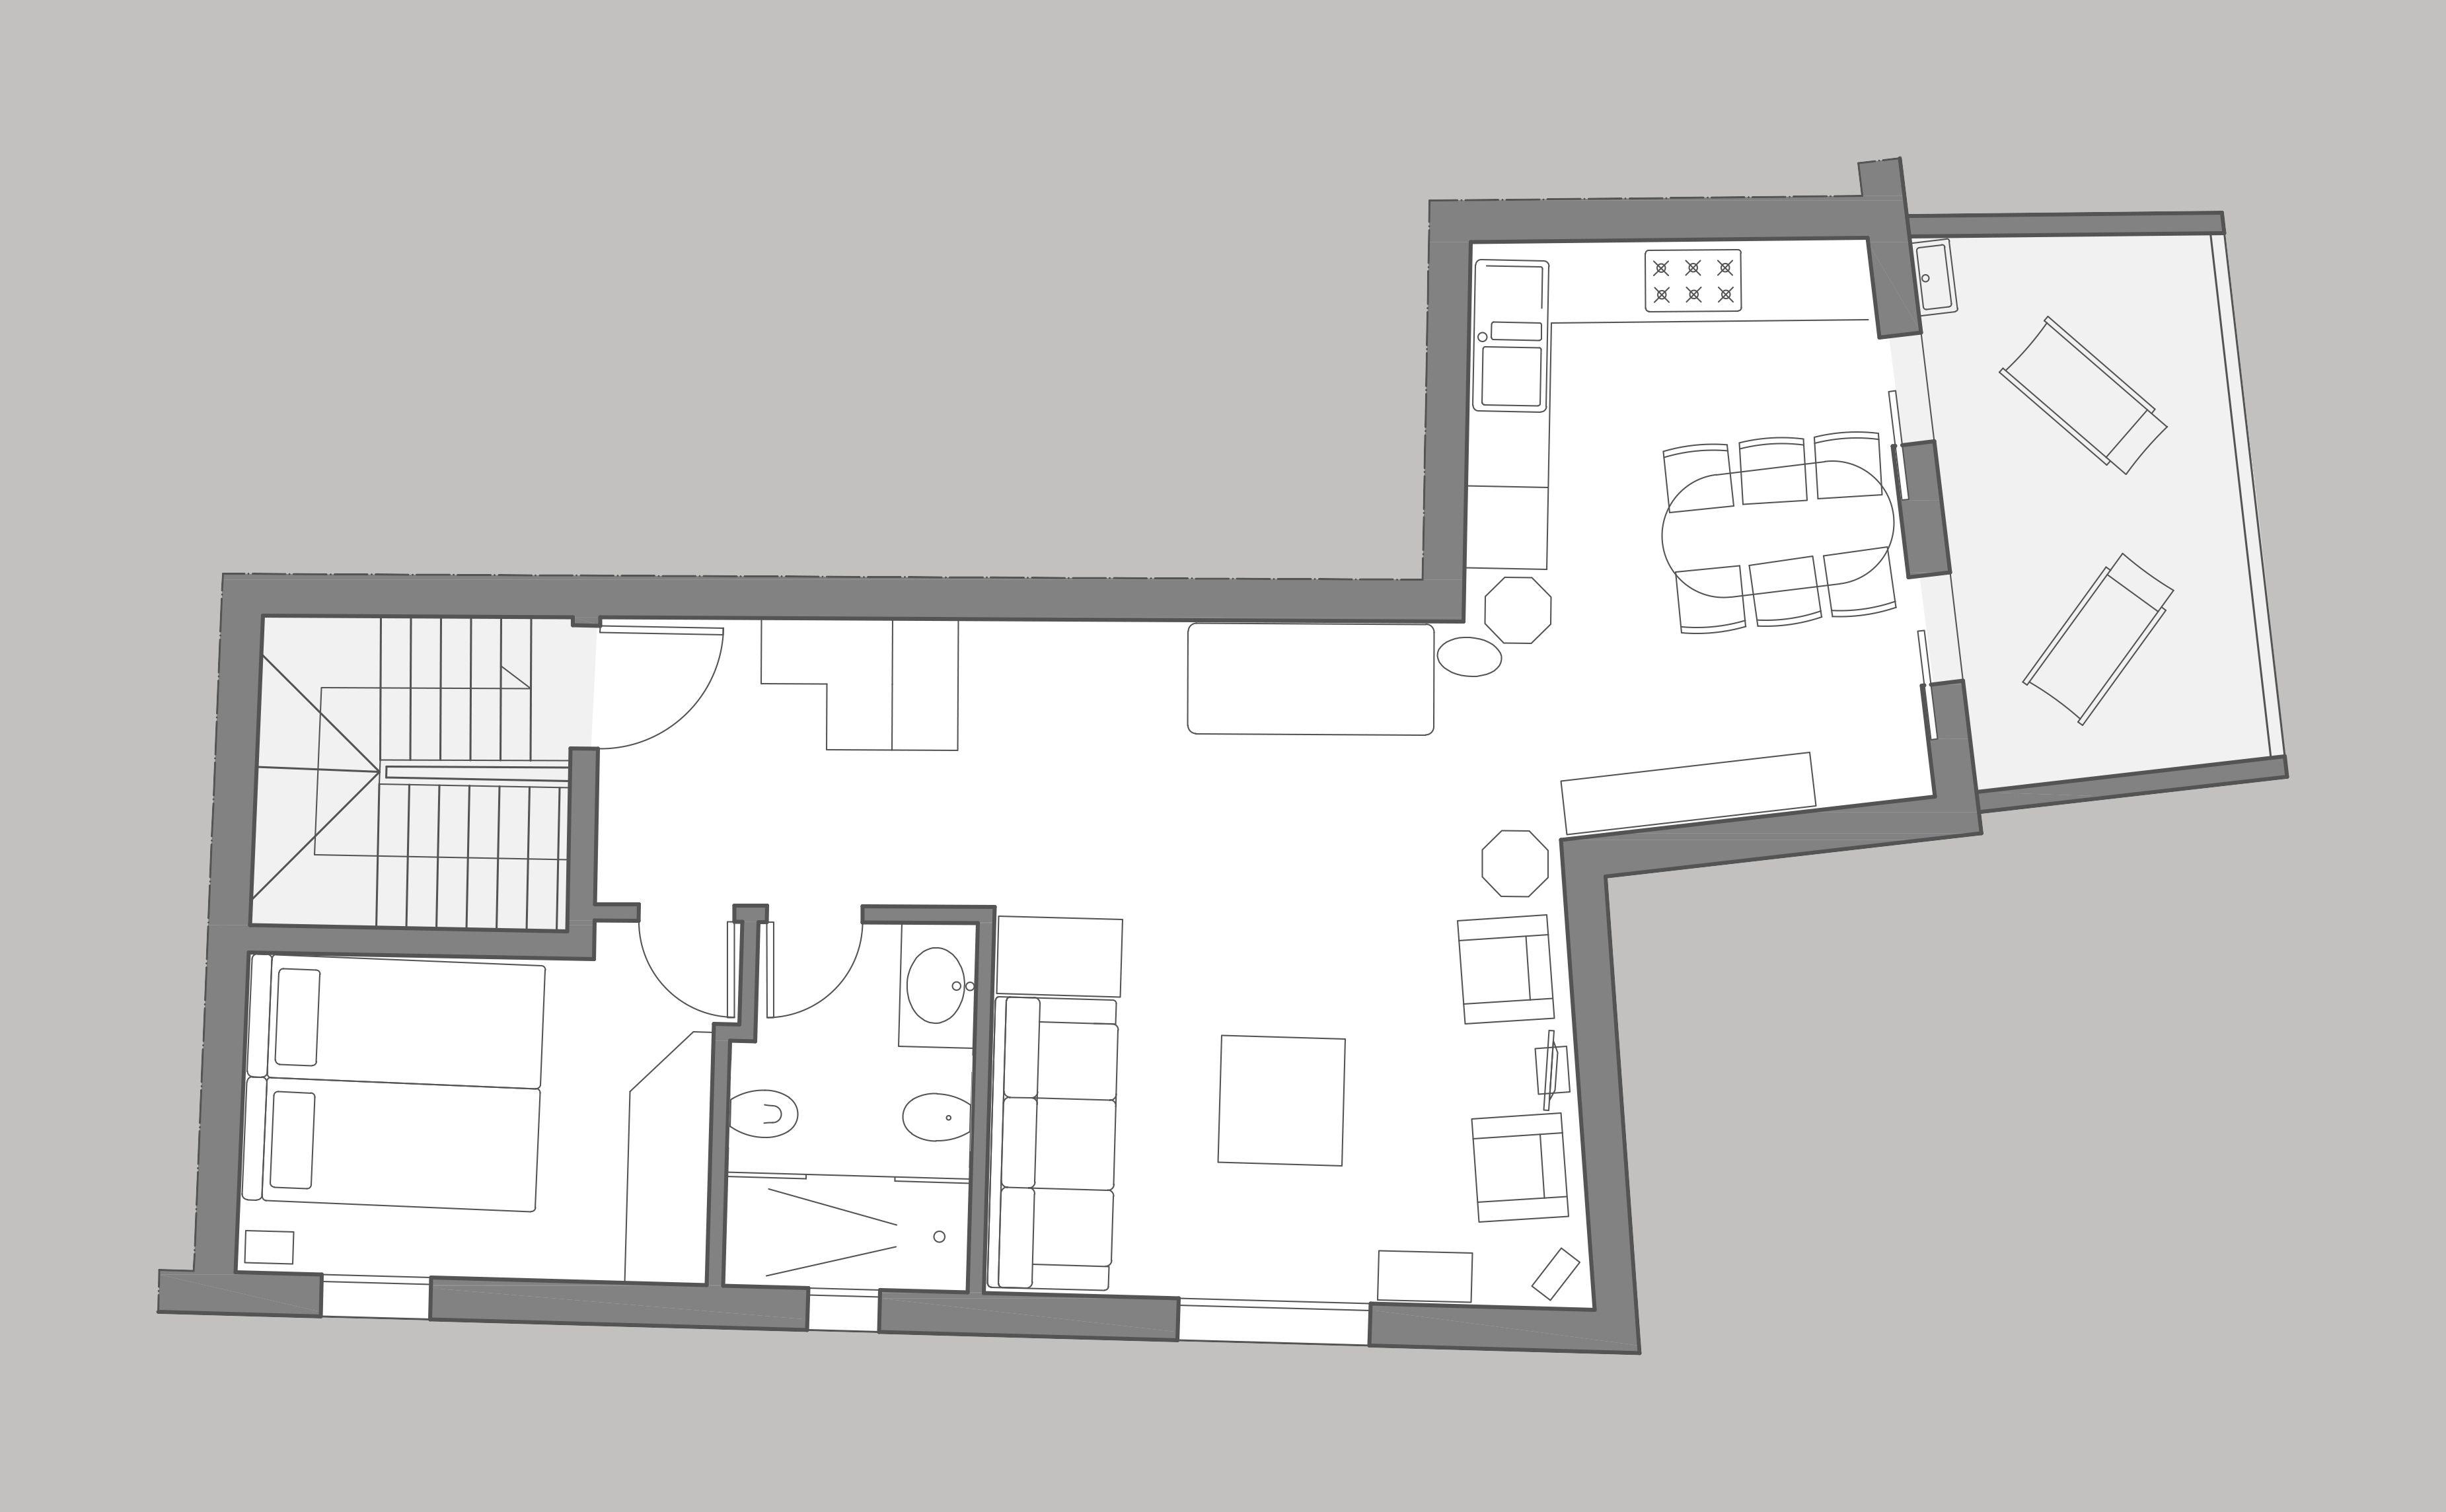 Dandolo floor plan